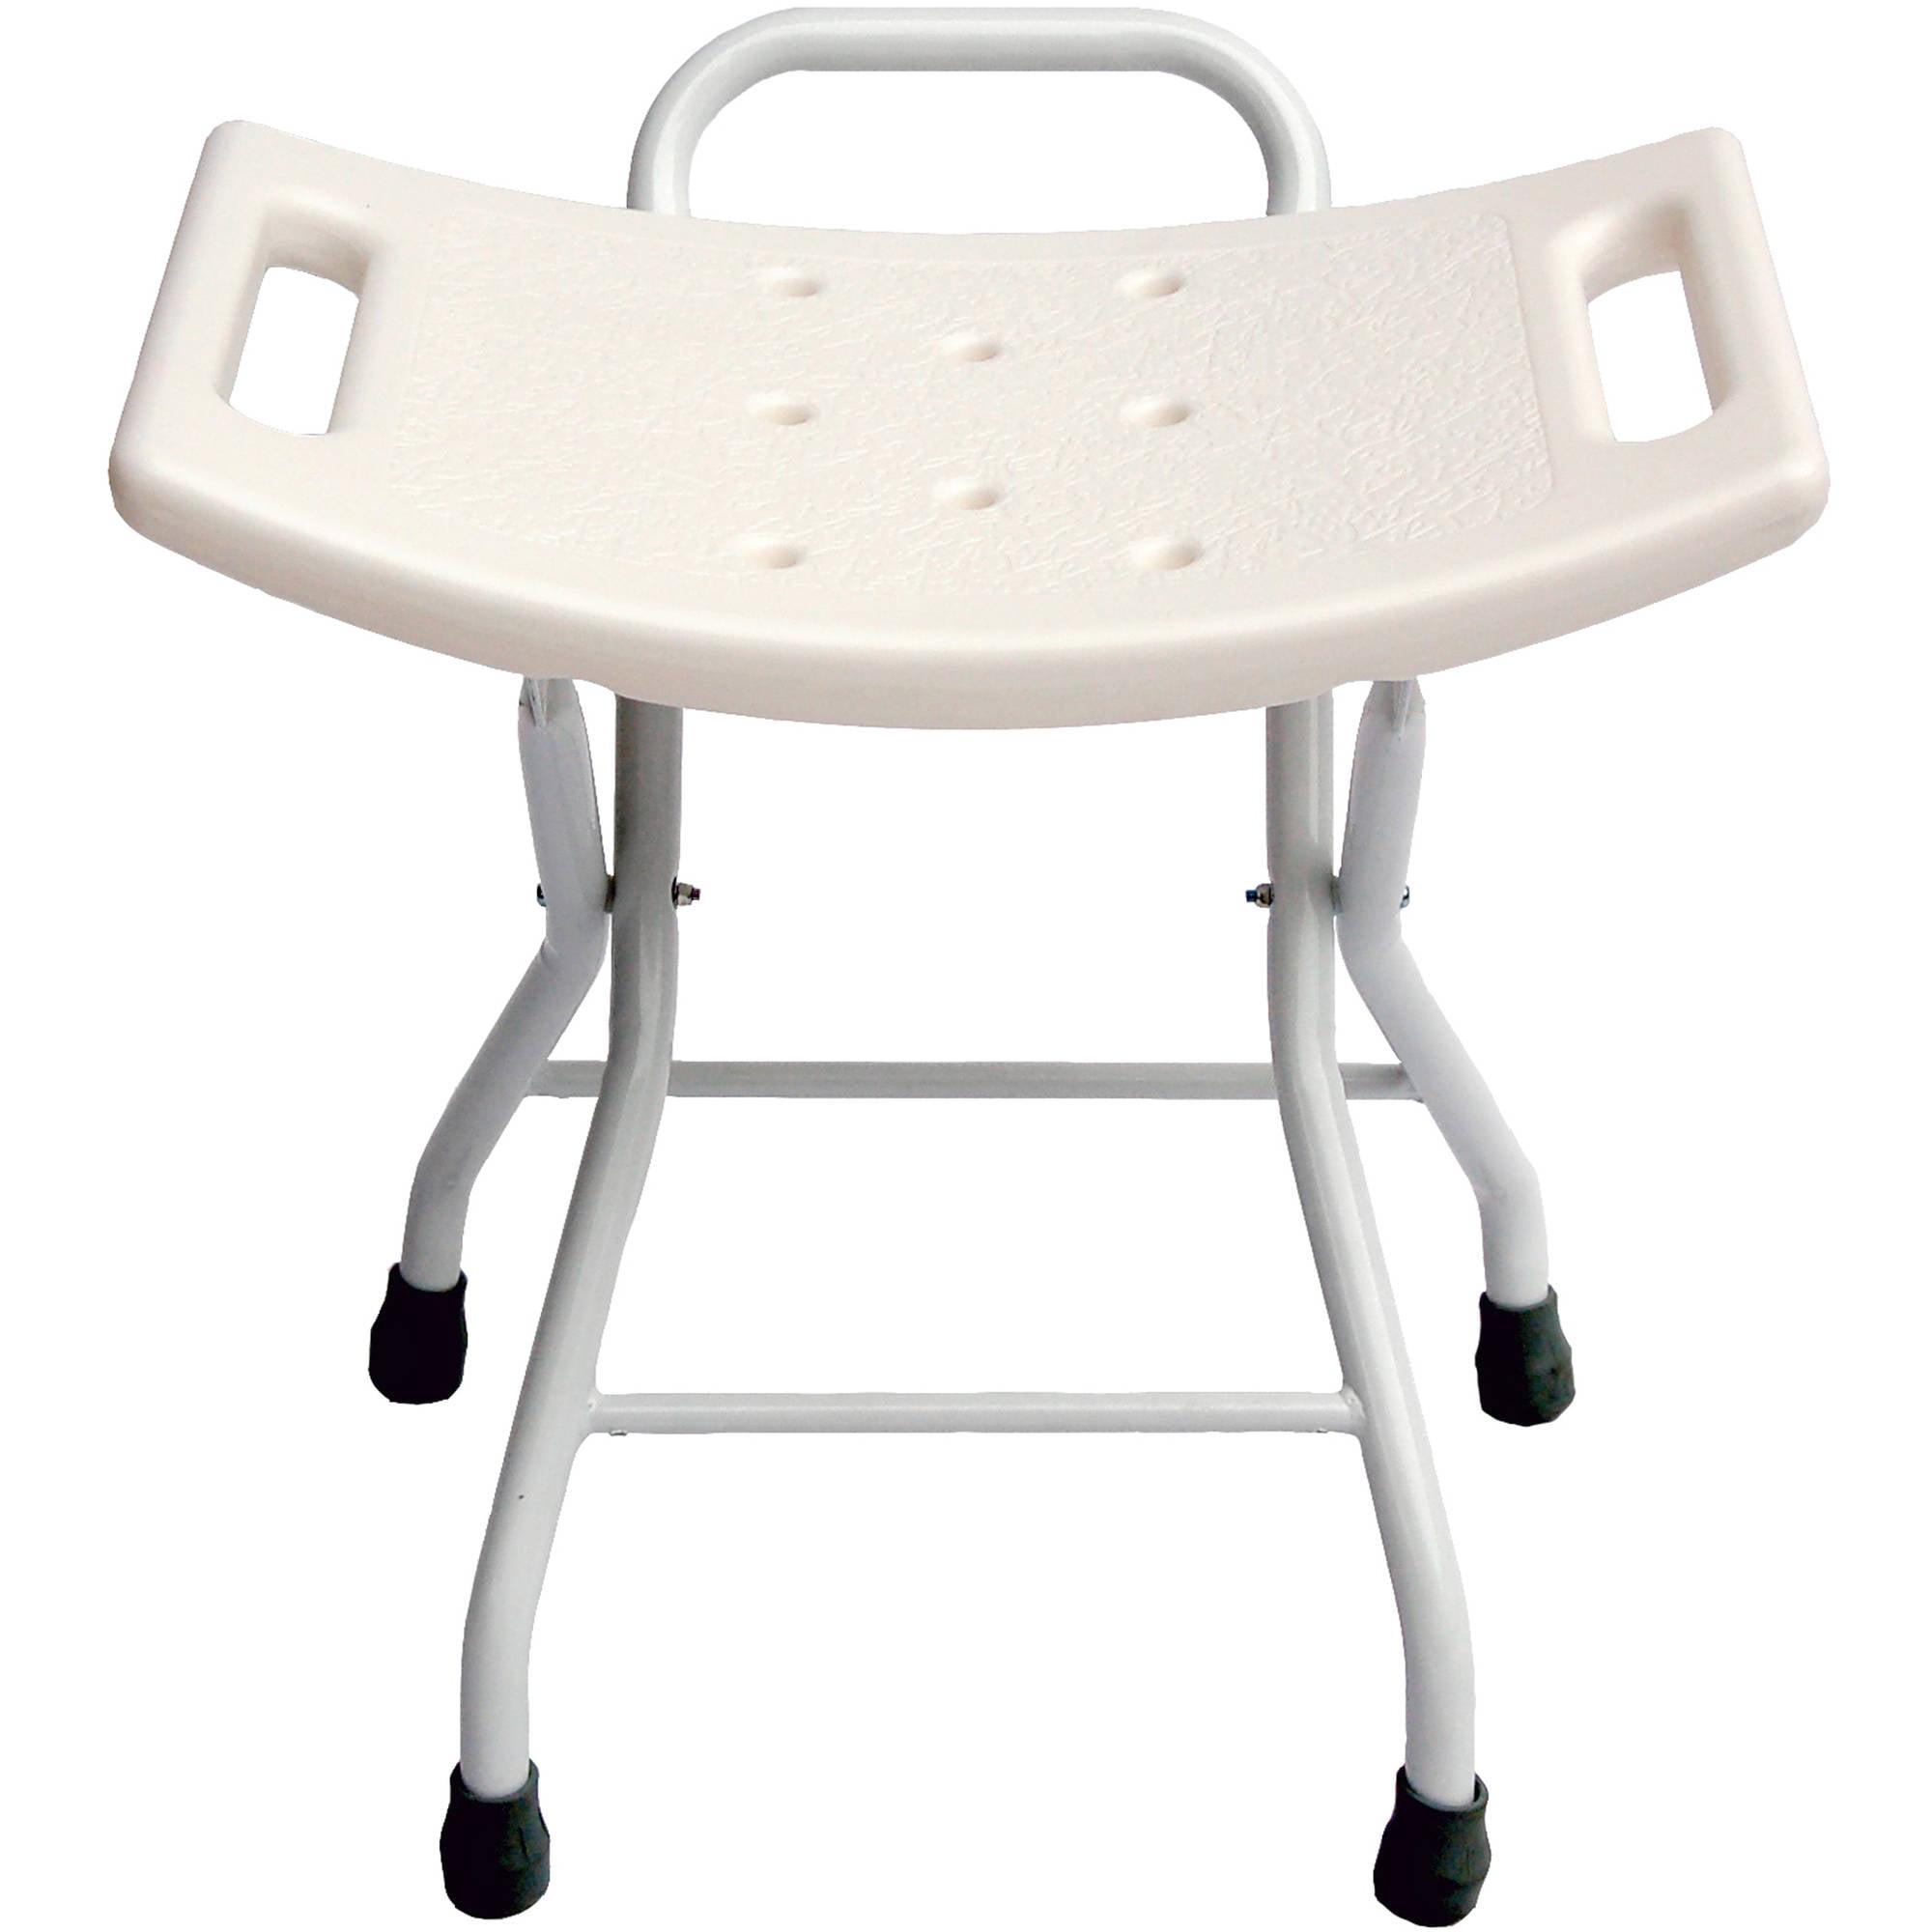 Image of Accela Folding Bath Chair